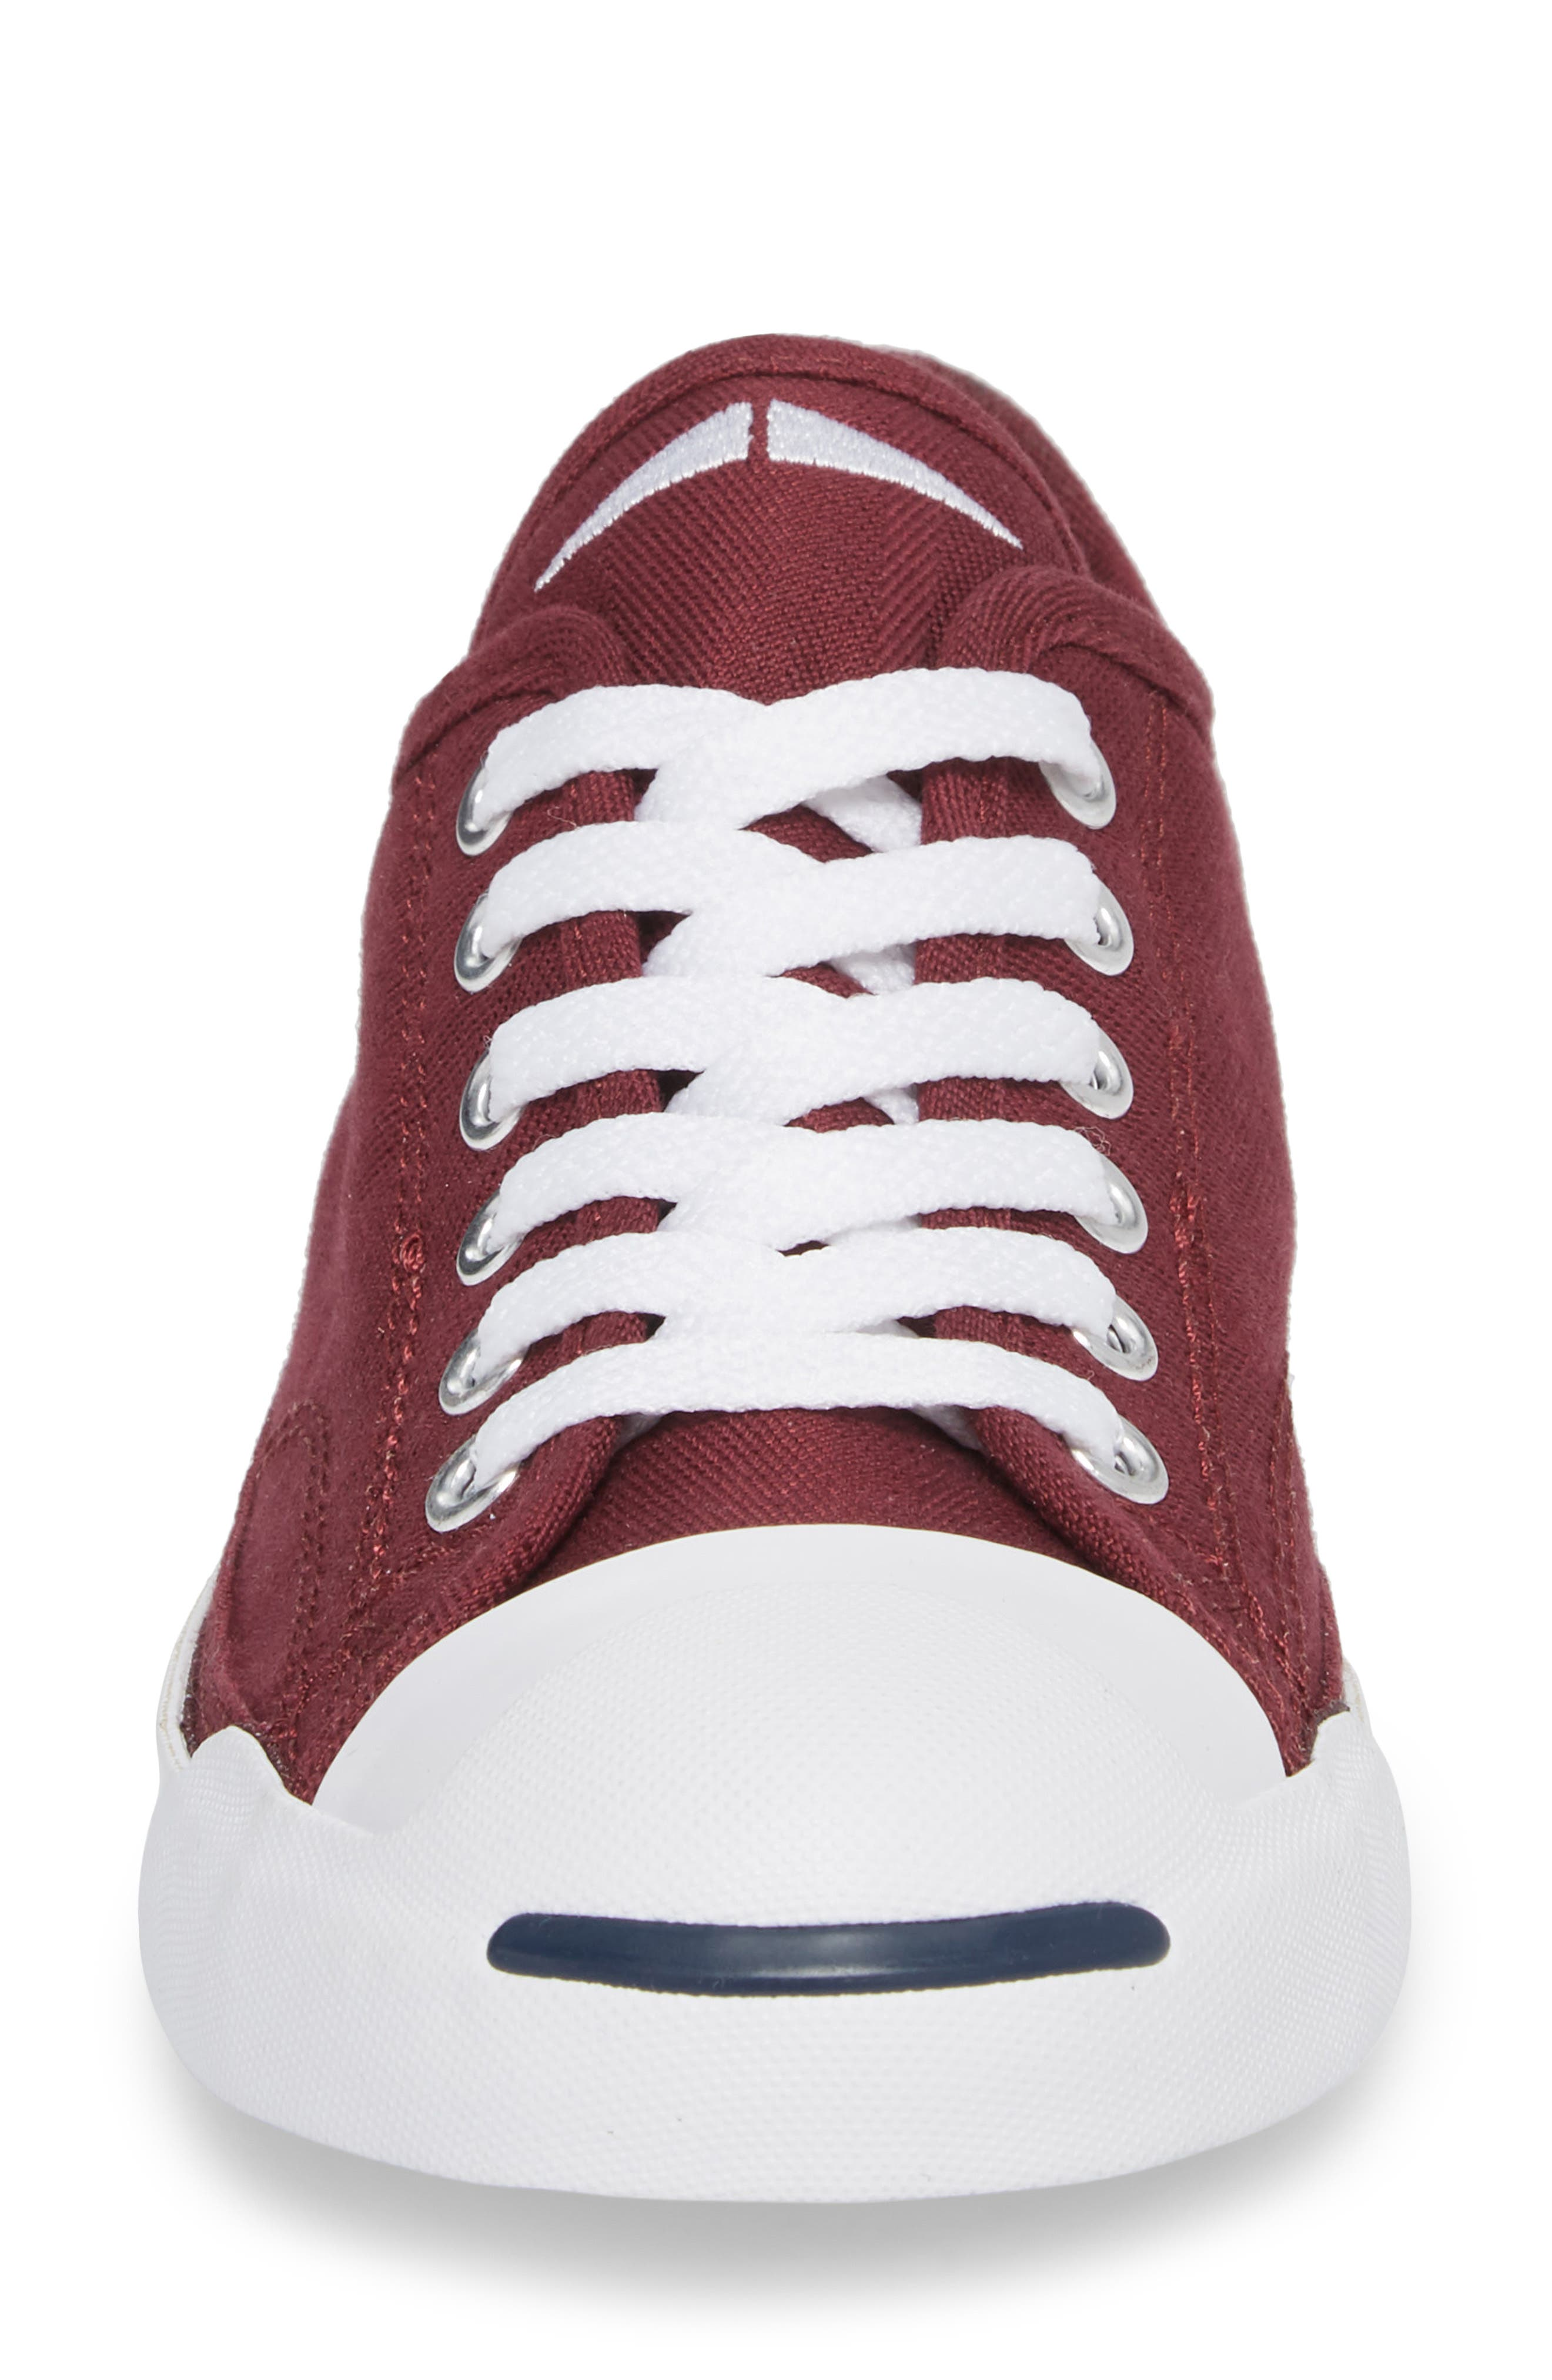 Jack Purcell Low Top Sneaker,                             Alternate thumbnail 4, color,                             DARK BURGUNDY